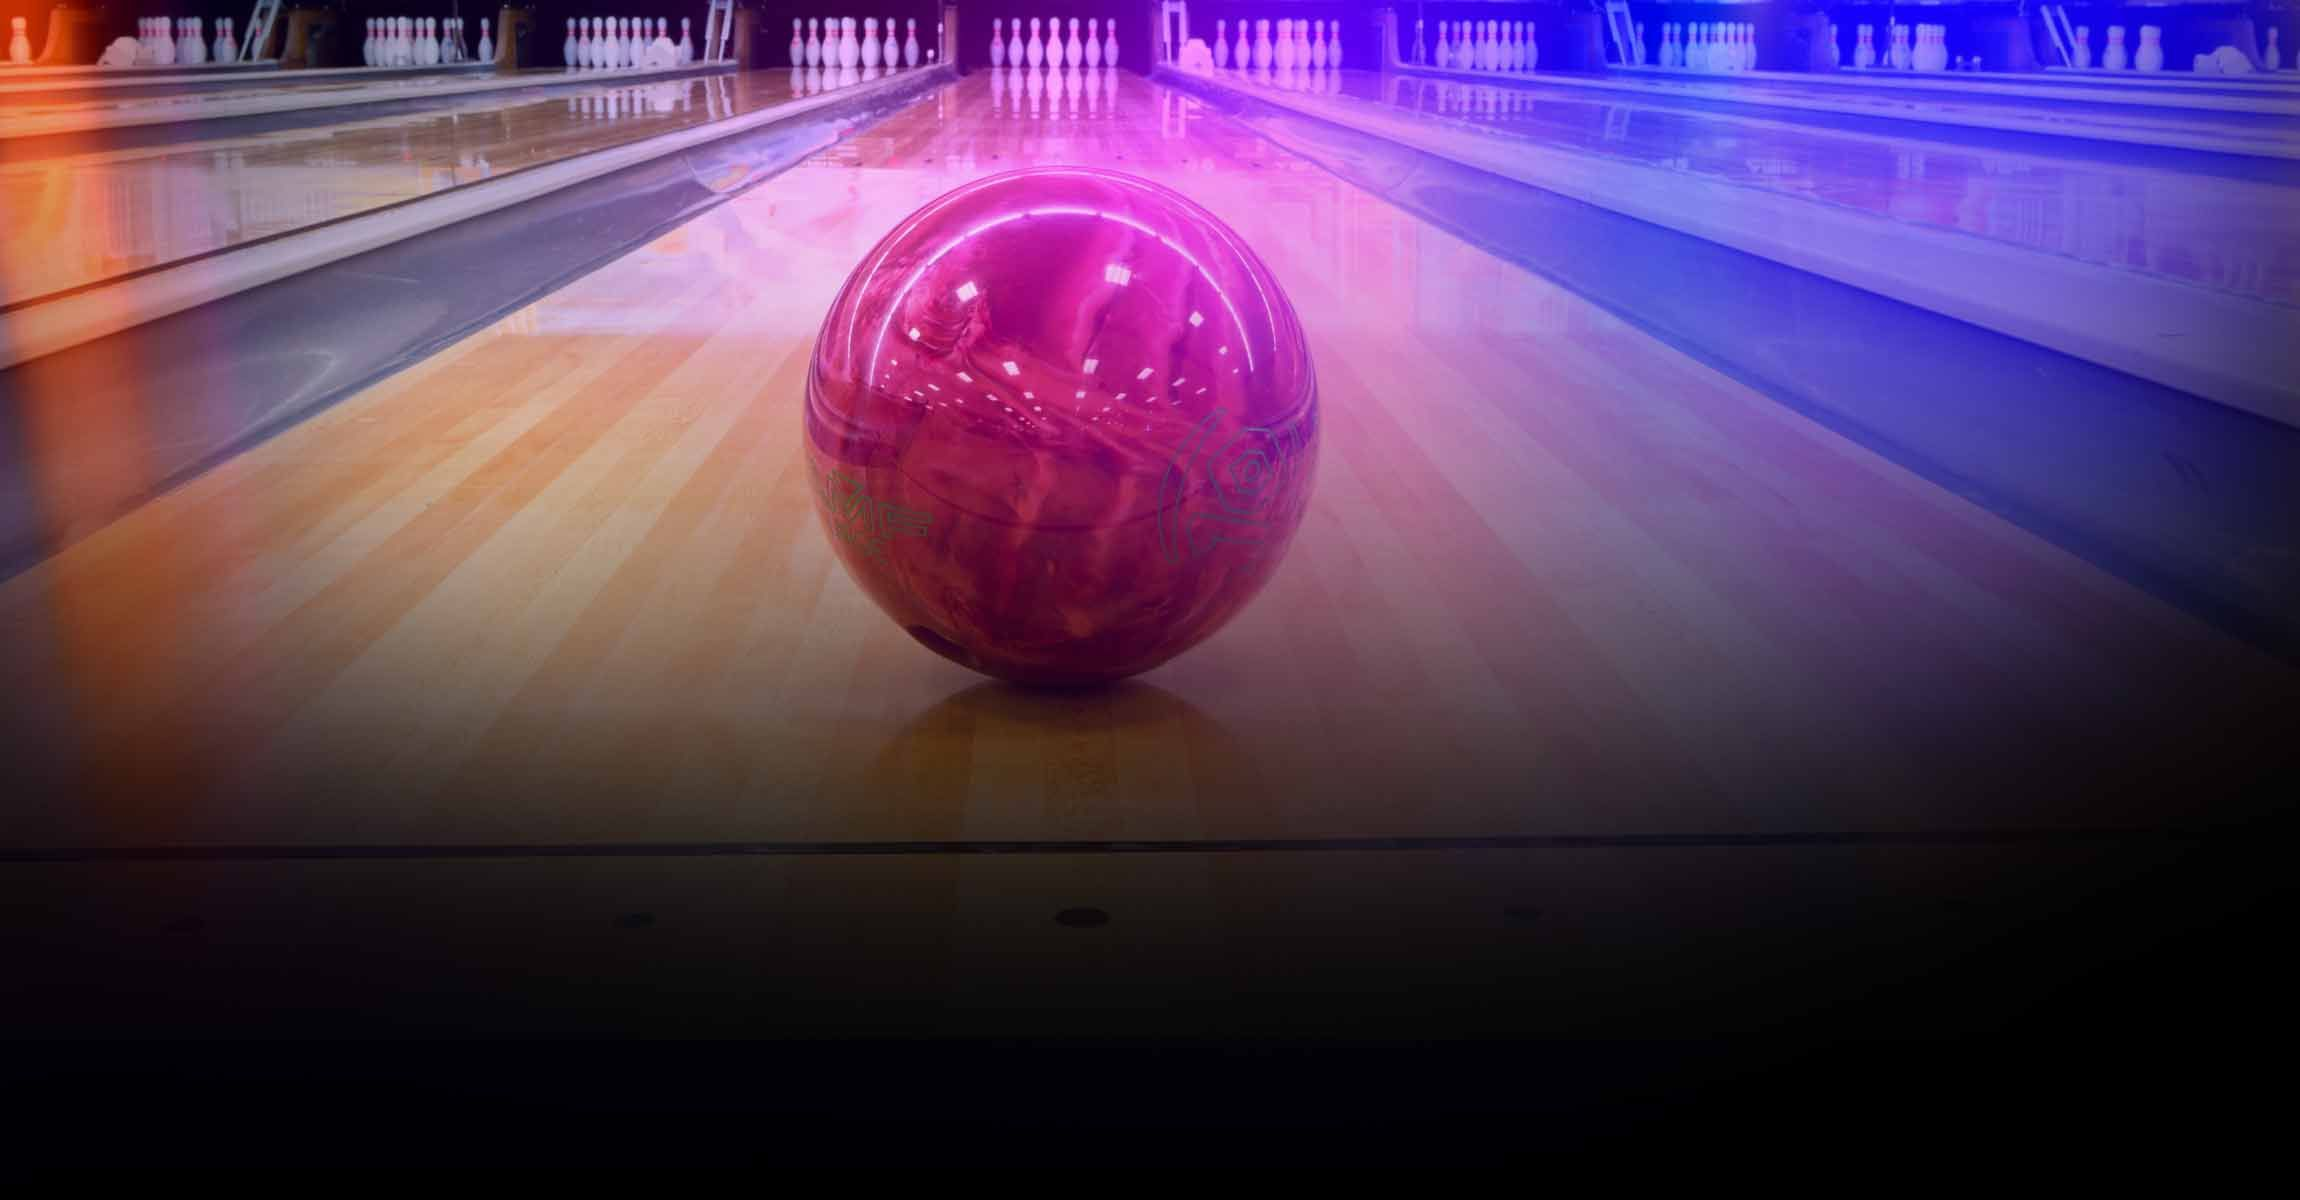 Bowling Alleys Amf Bowling Amf Dale City Lanes Woodbridge Va Best Bowling Centers Bowling Center Amf Bowling Bowling Alley